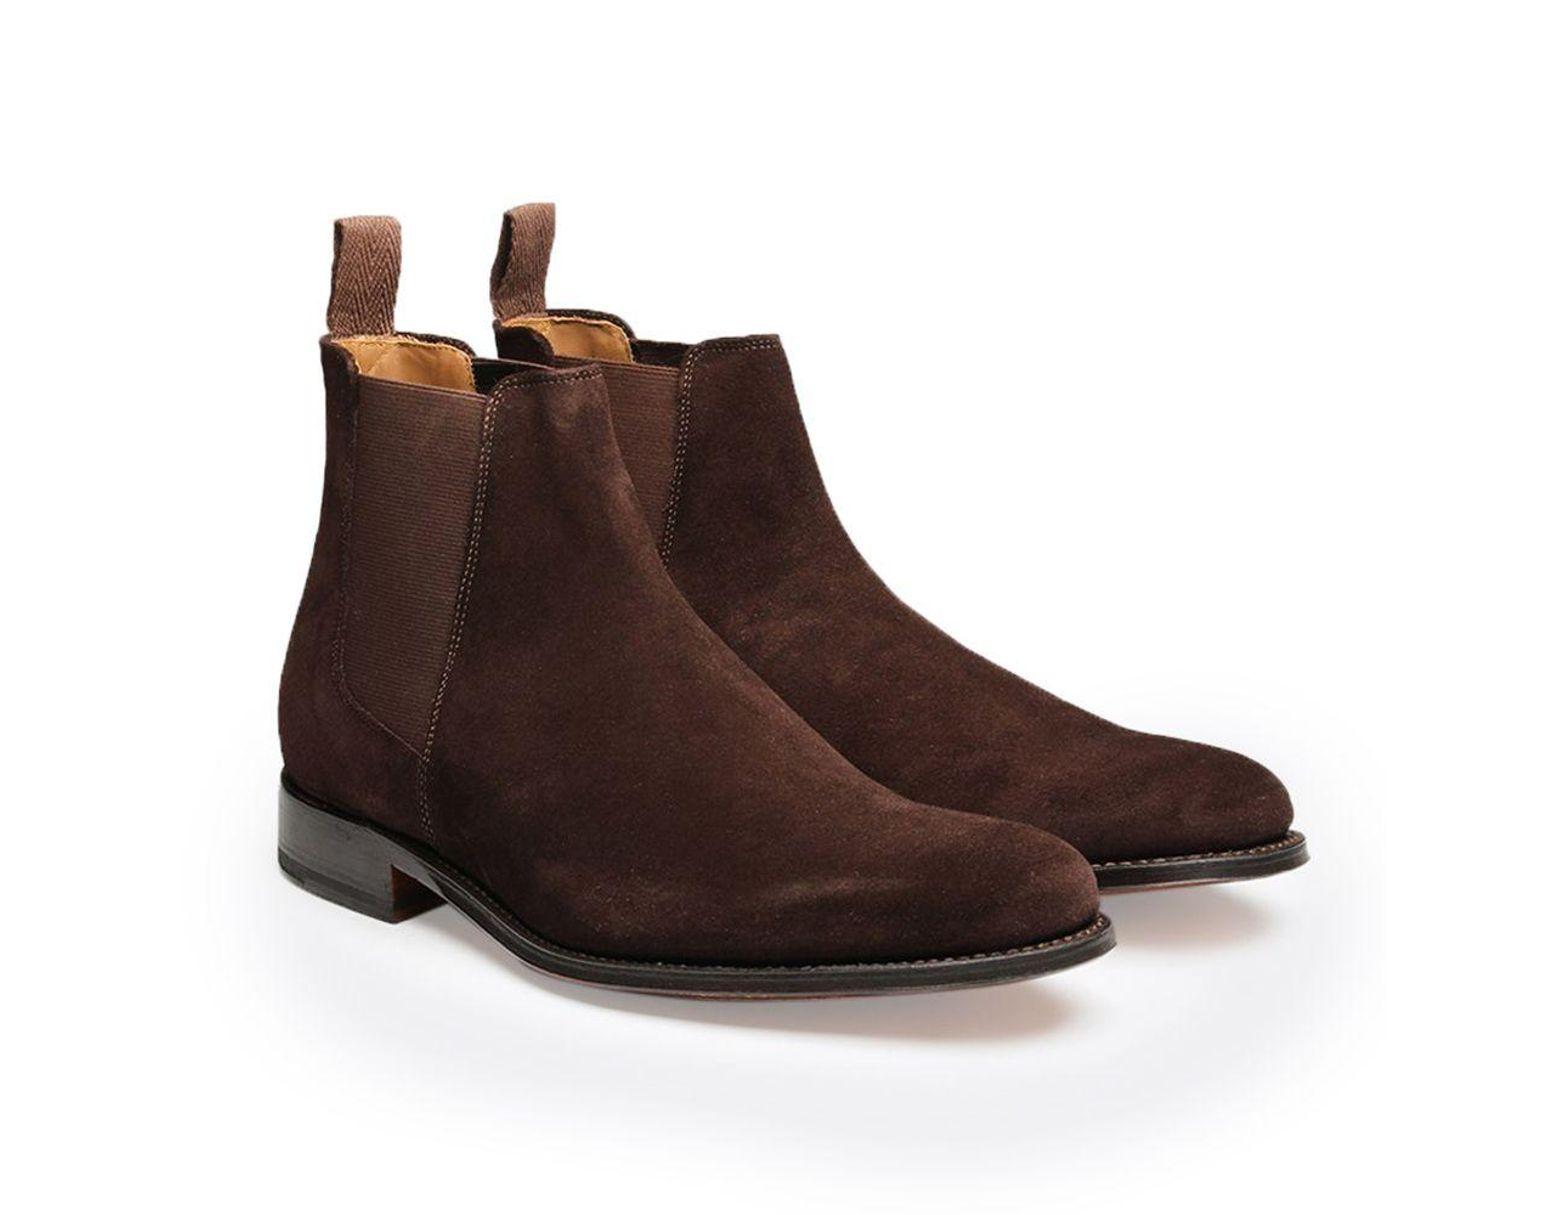 9b934e9e5ac Men's Chocolate Brown Declan Suede Chelsea Boots